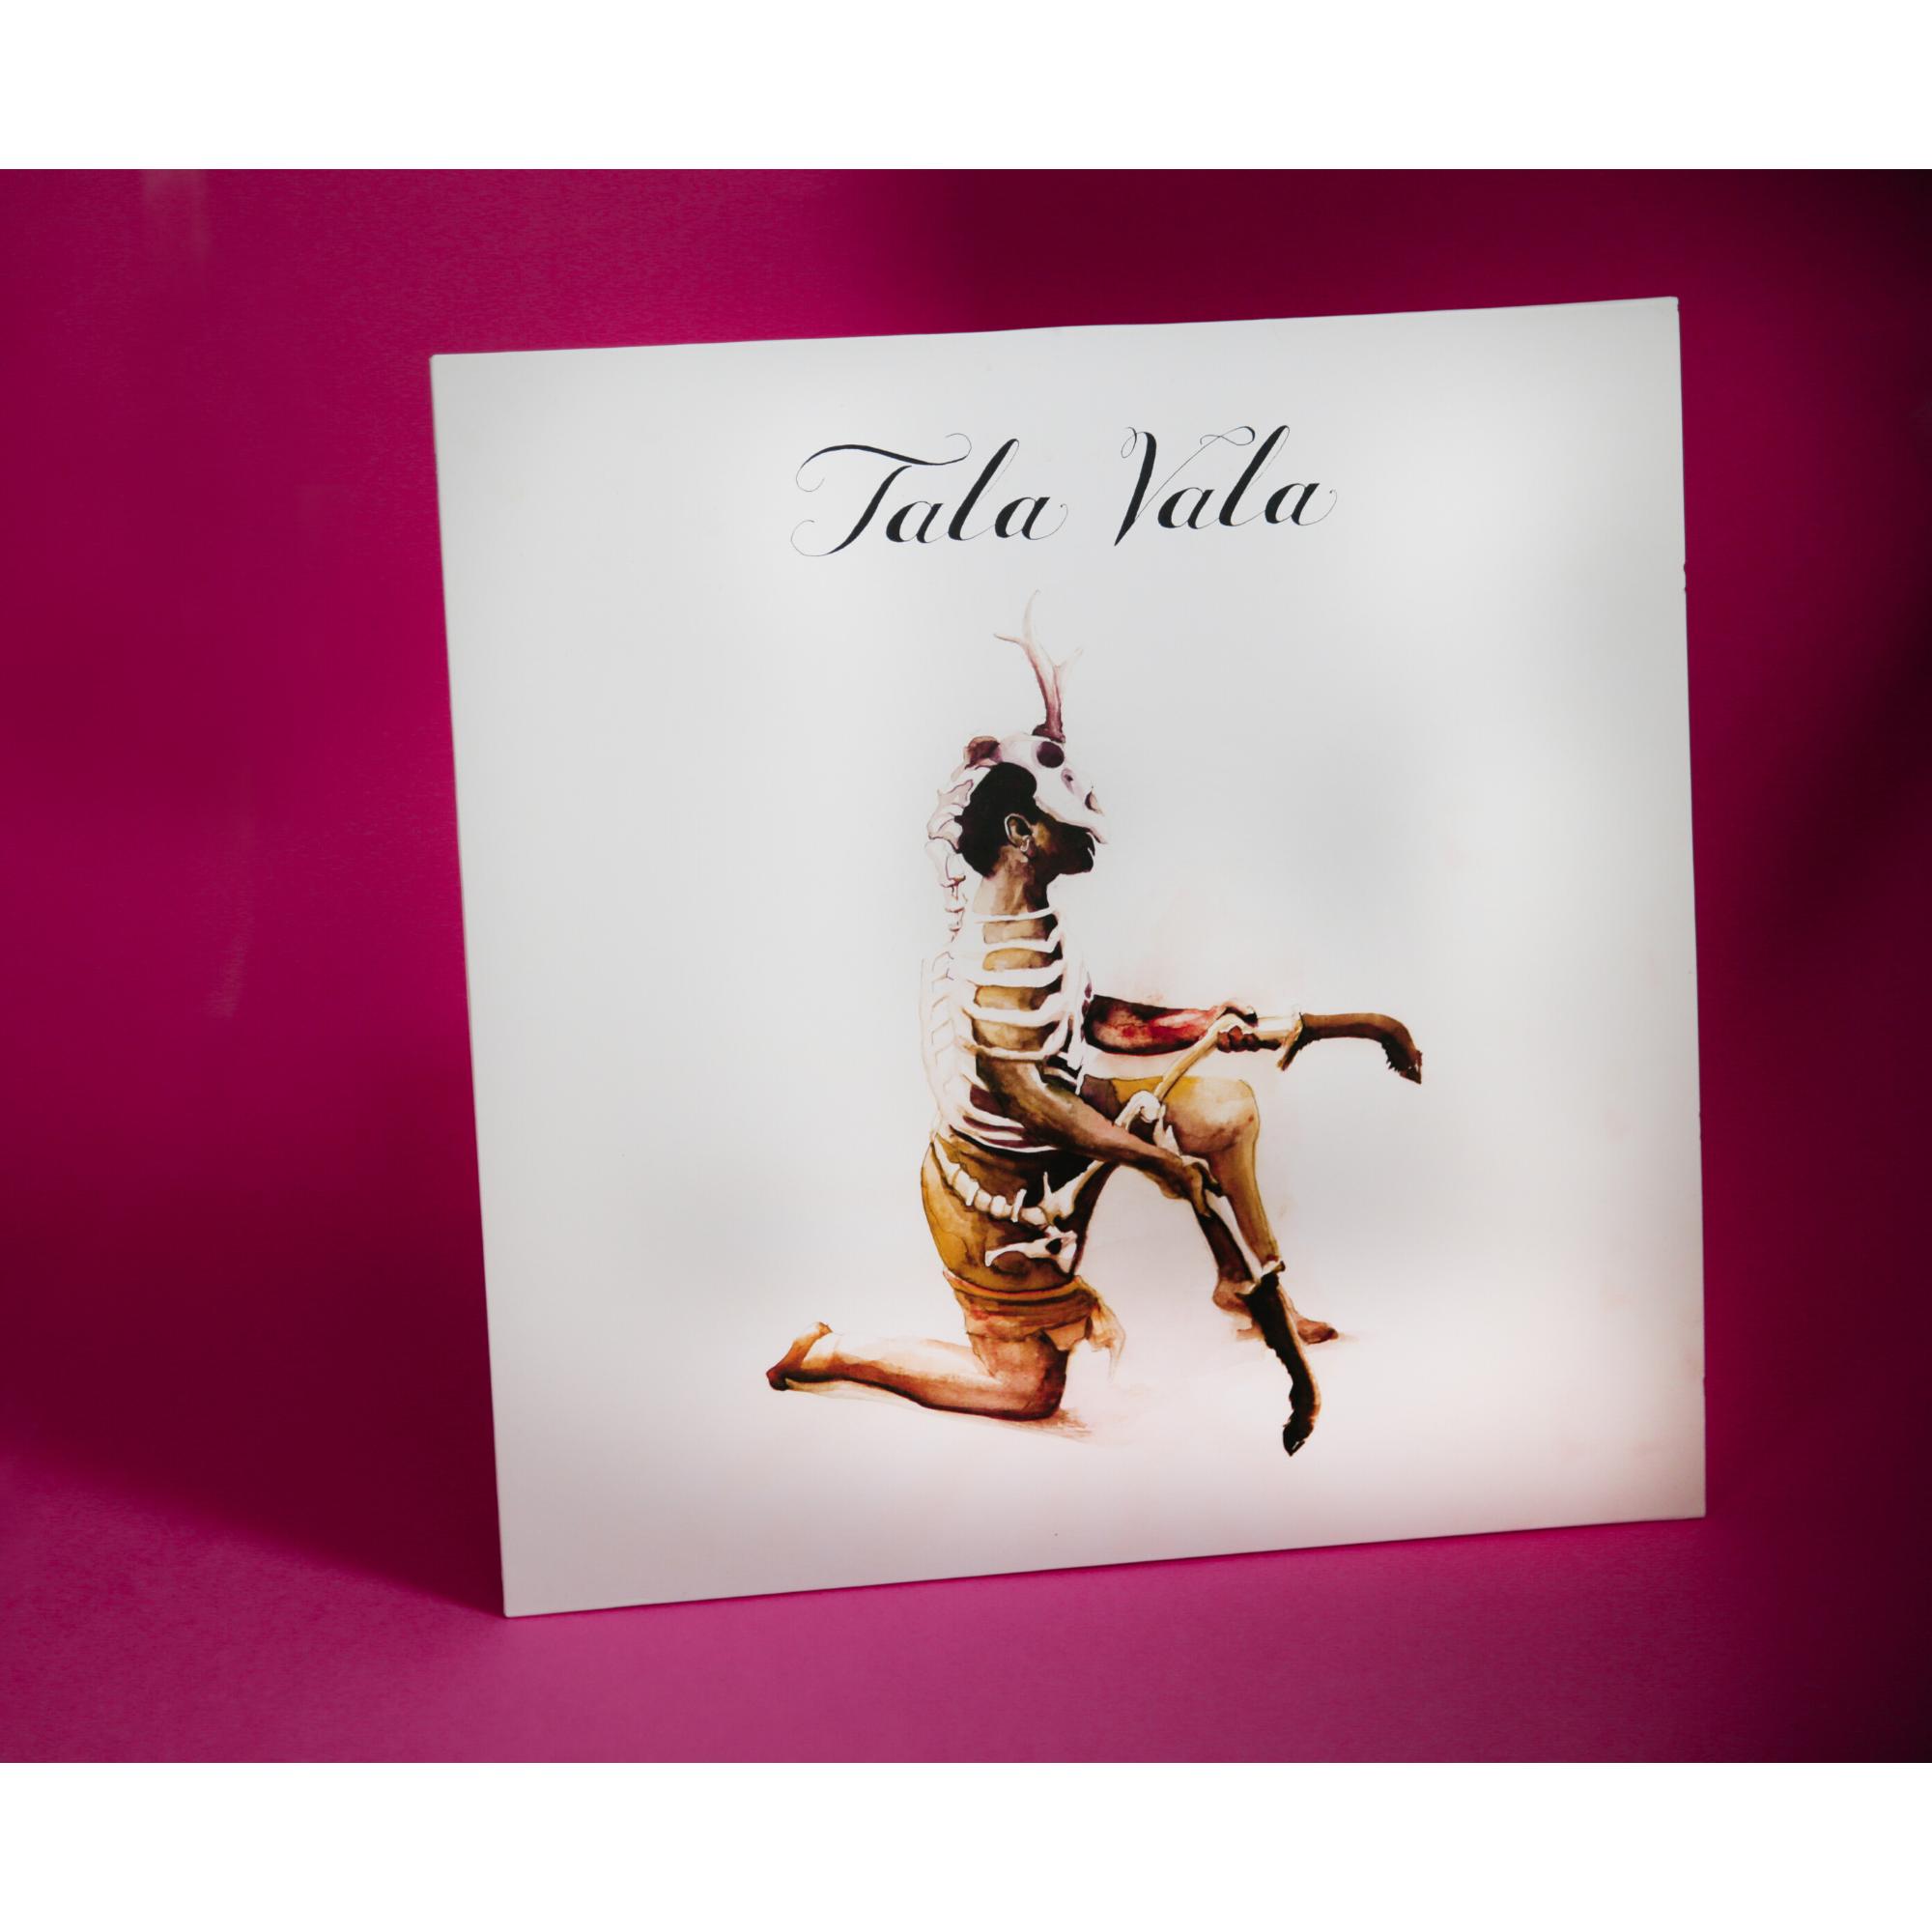 TV White Label Tala Vala - Tala Vala (Exclusive STP Edition)